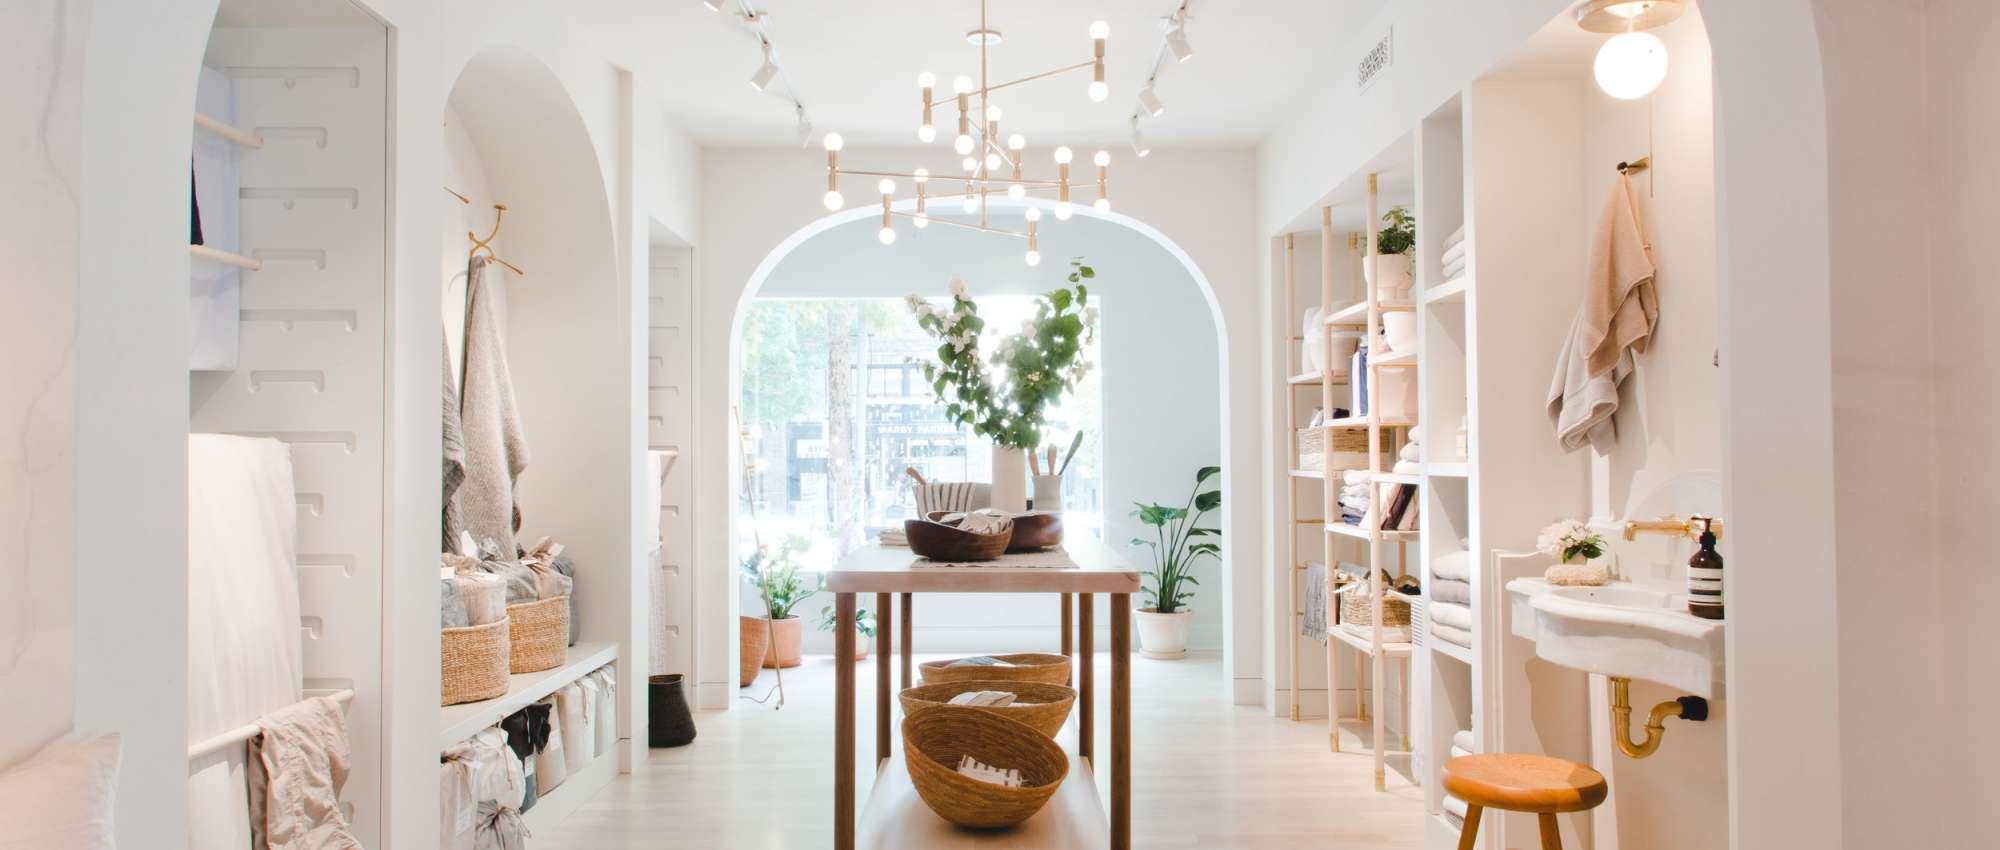 6 interior design trends for 2020